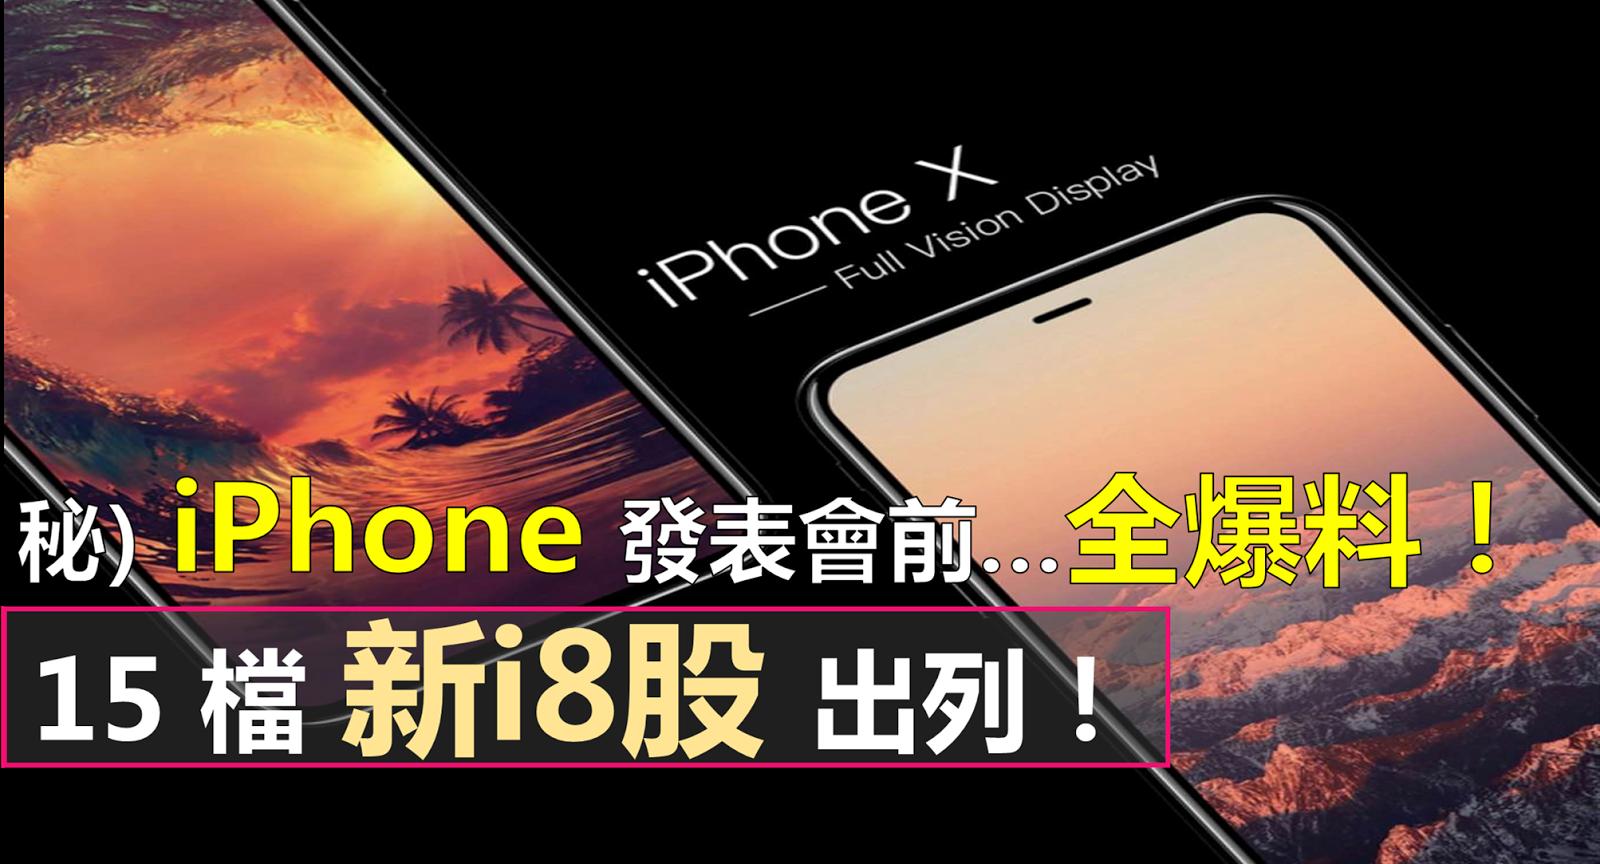 iPhone 發表會,全爆料!該買?3 大「看頭」、15 檔『新i8股』,別錯過甜蜜行情!